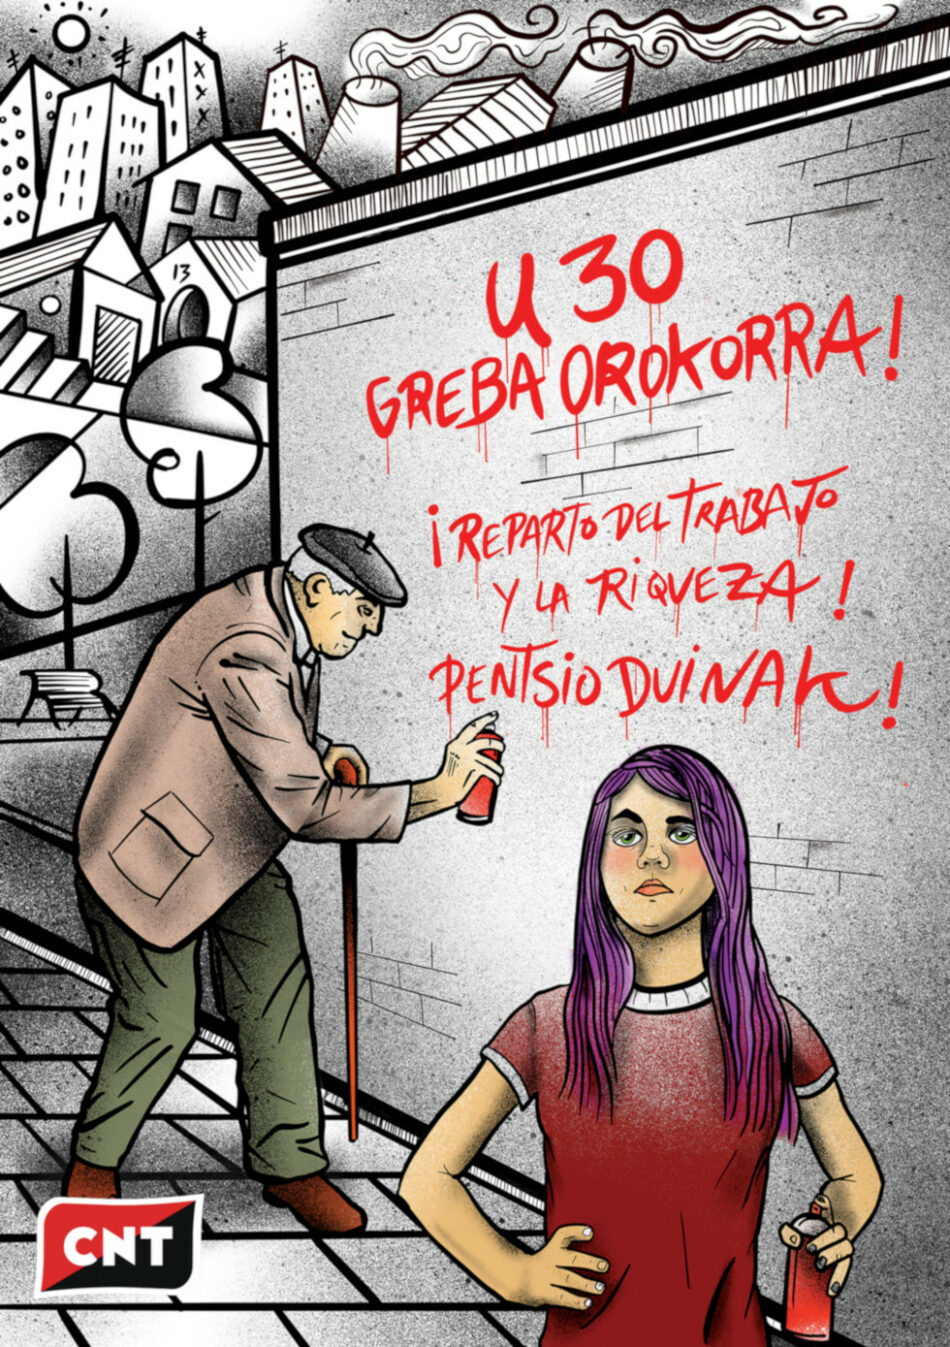 30 de enero. Huelga General en Euskal Herria